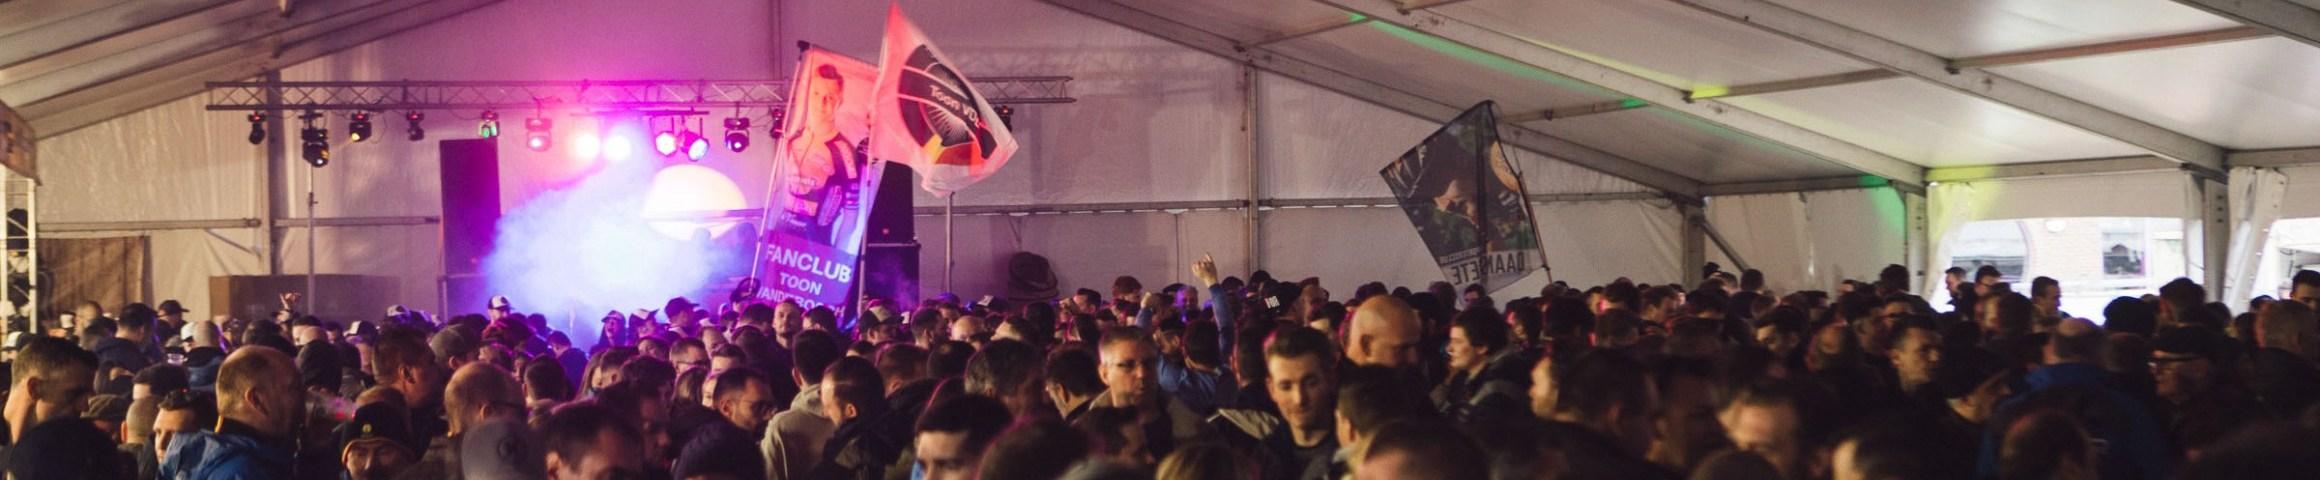 DVV Trofee party tent at krawatencross